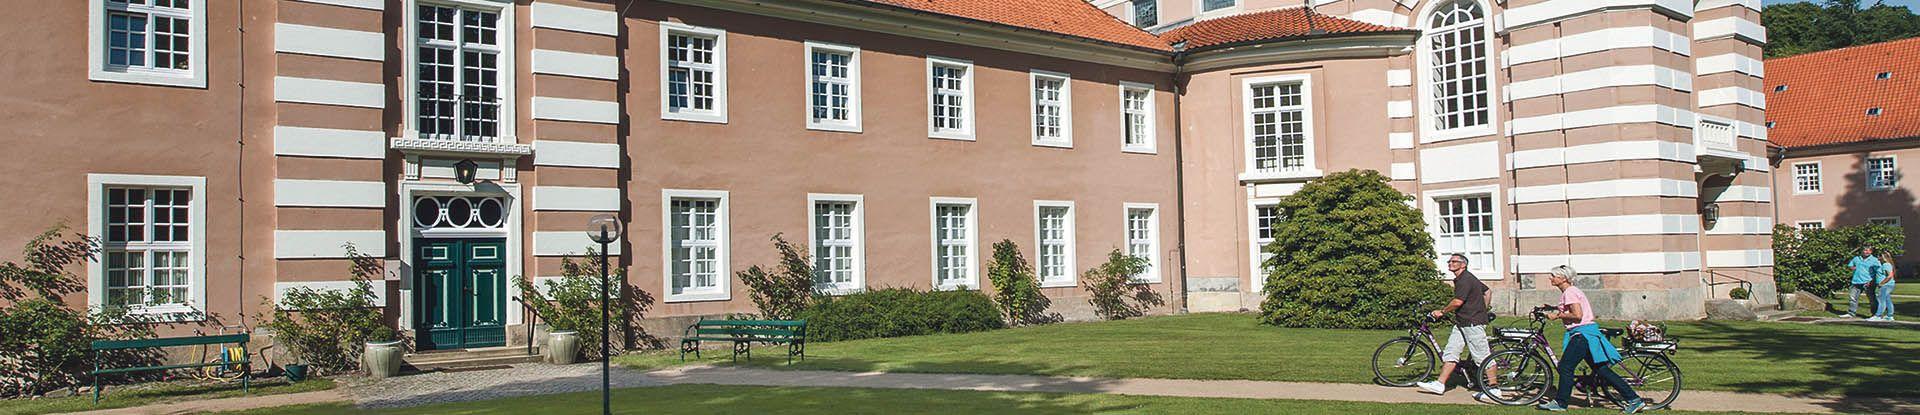 Radfahrer am Kloster Medingen